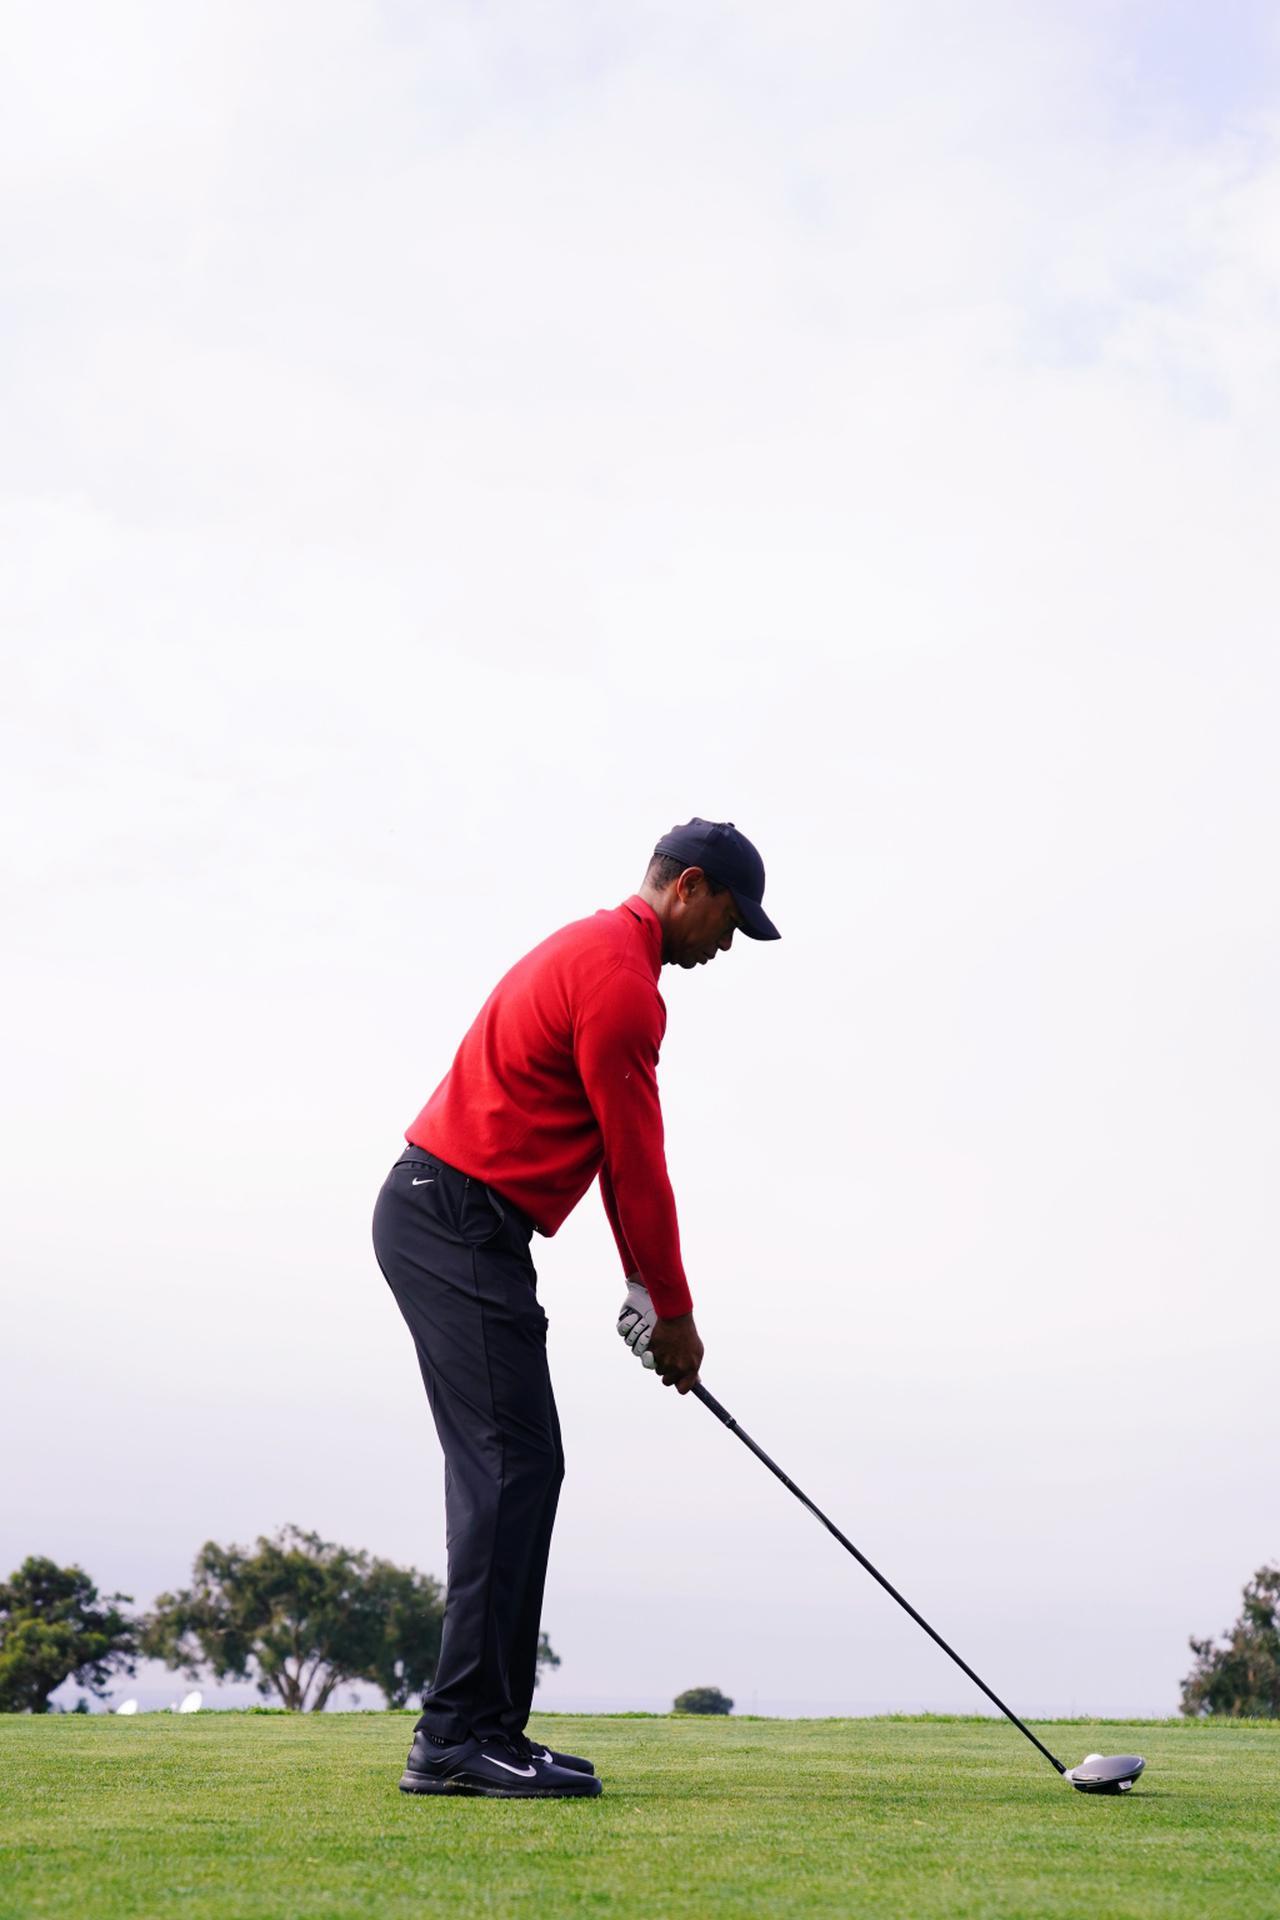 Images : 1番目の画像 - タイガー・ウッズのドライバー連続写真 - みんなのゴルフダイジェスト